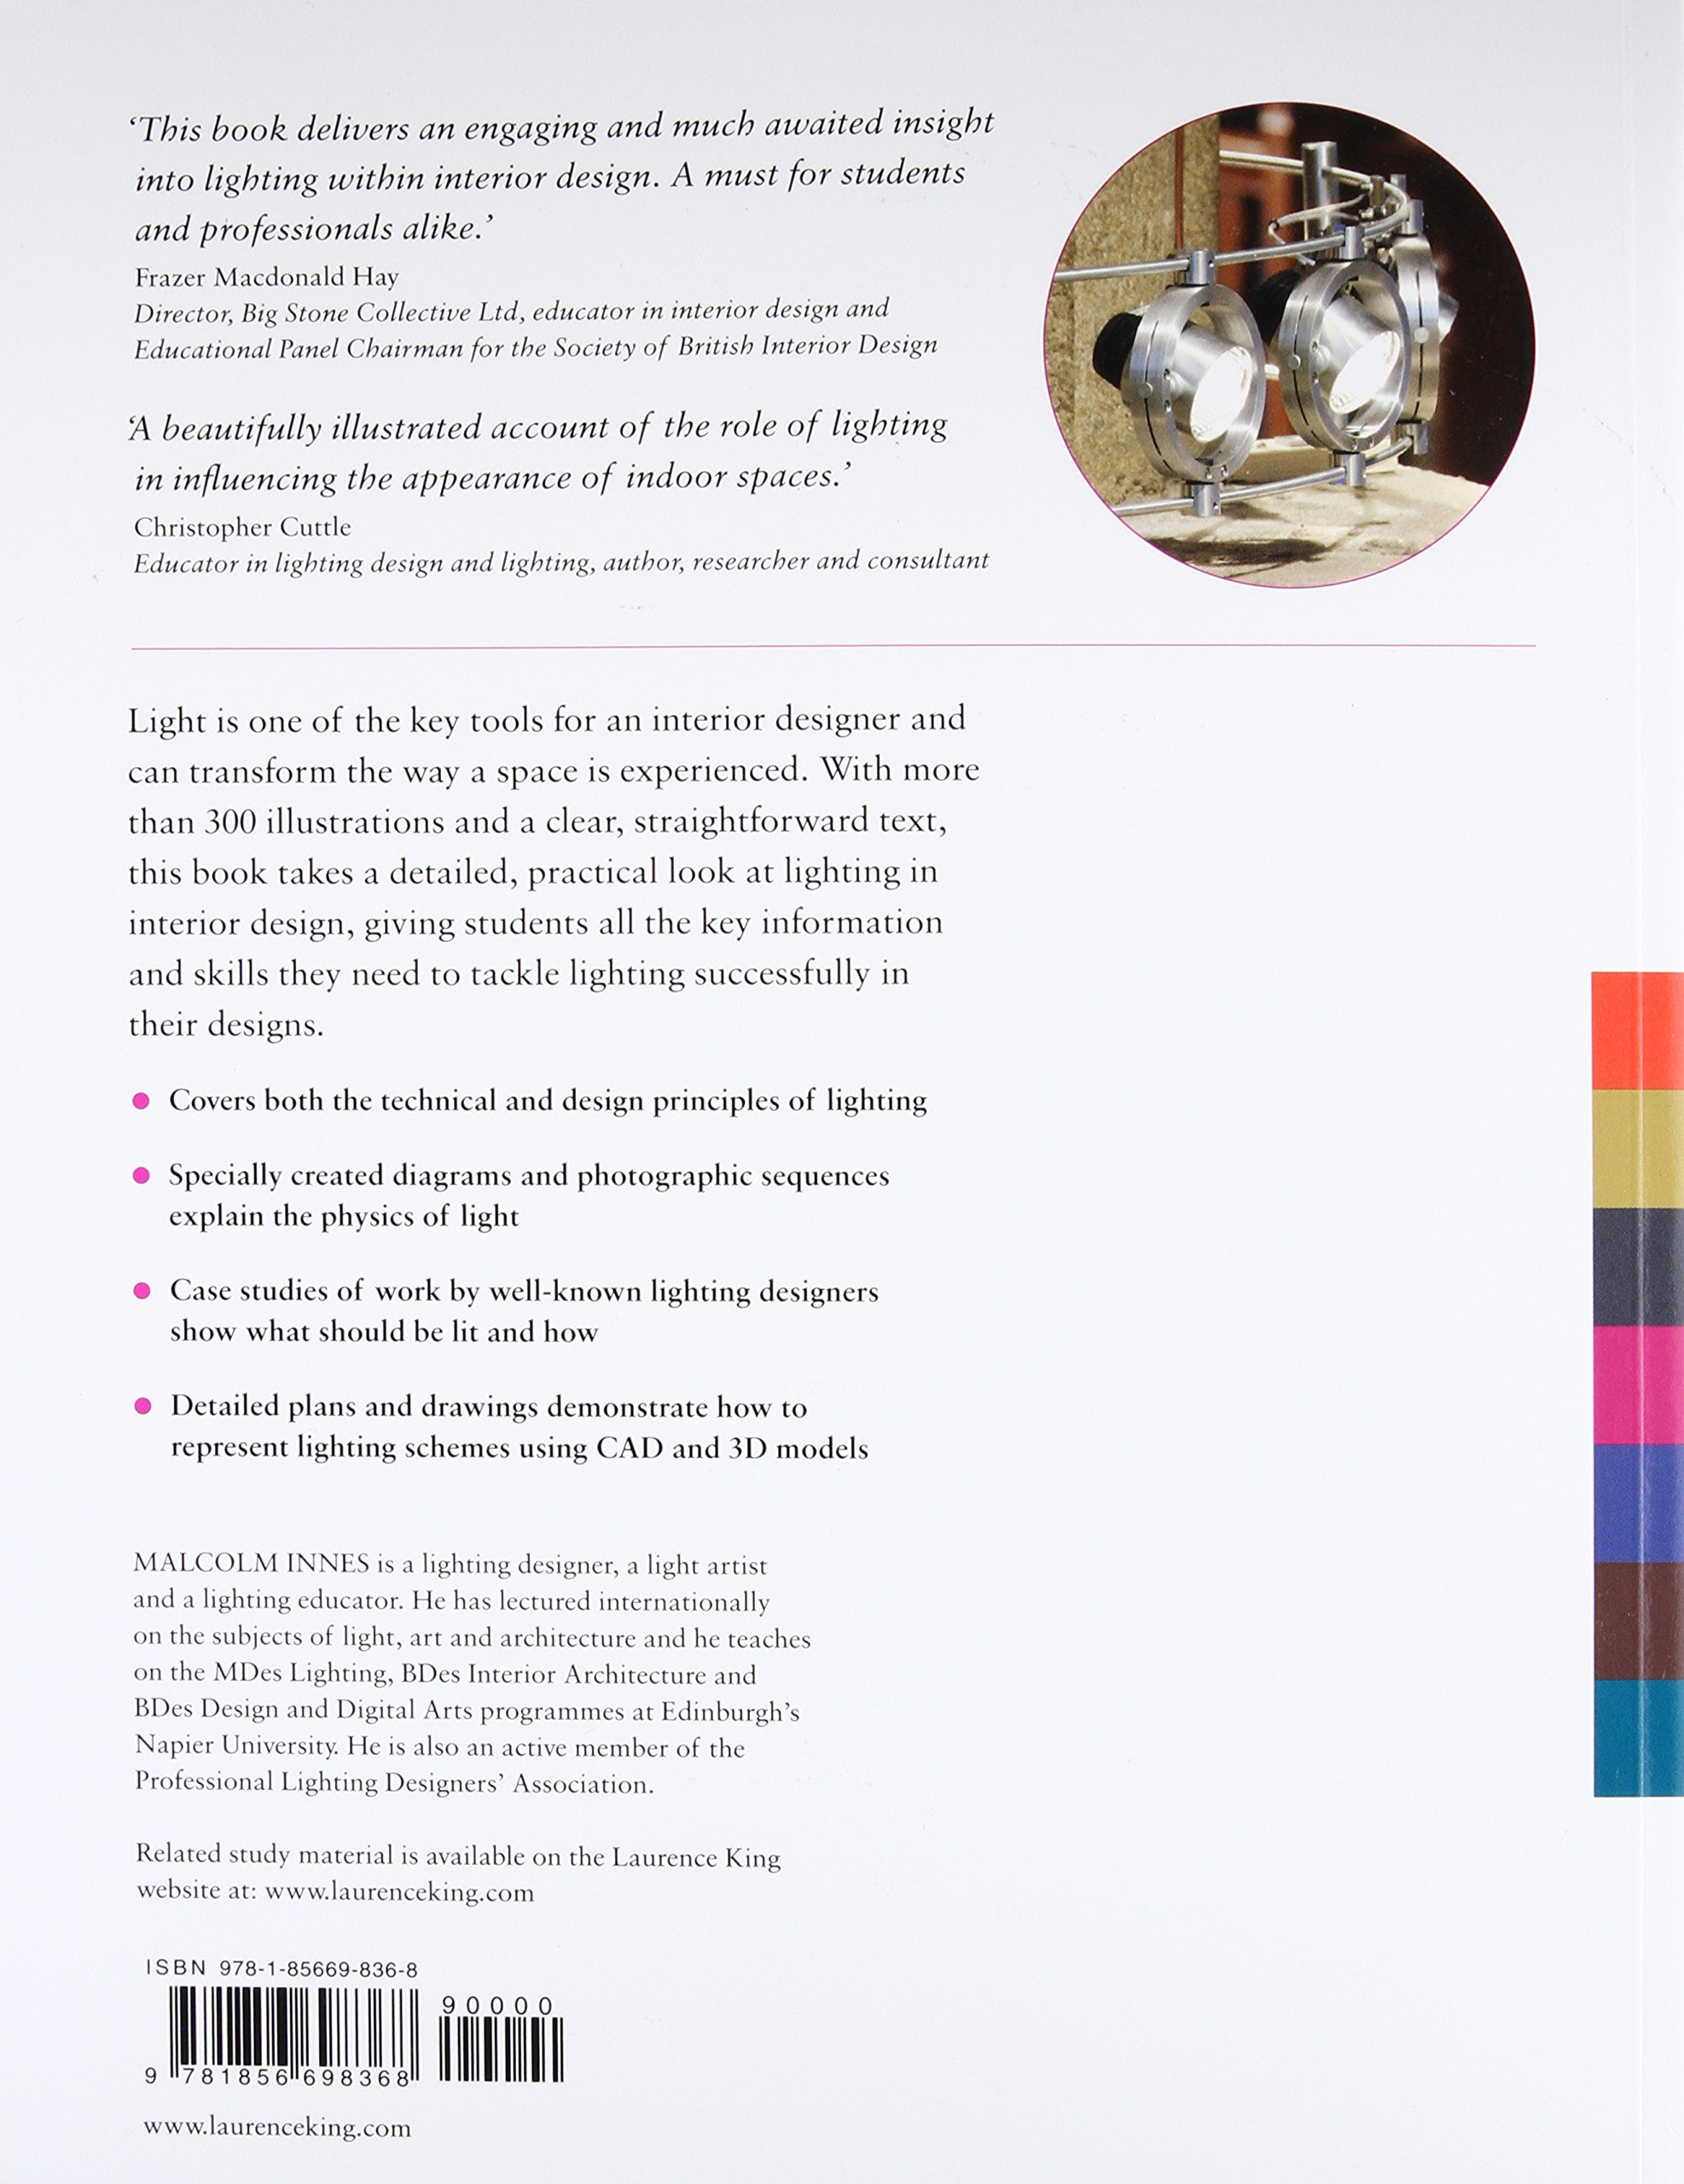 amazon lighting for interior design portfolio skills malcolm